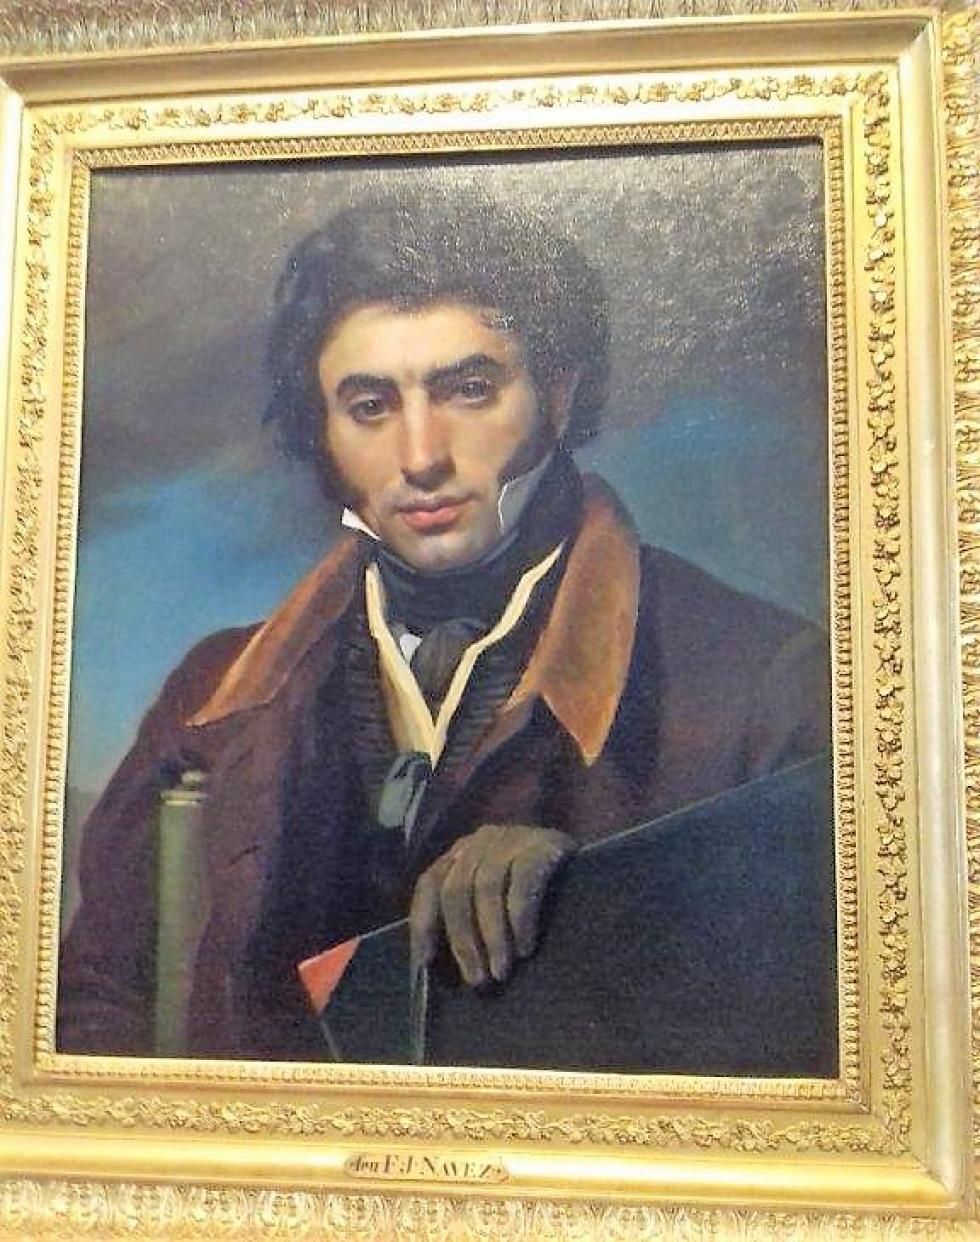 5 juillet 2018, Jean-Victor SCHNETZ par François-Joseph NAVEZ (Charleroi 1787 - Bruxellres 1869), hst, 1820.